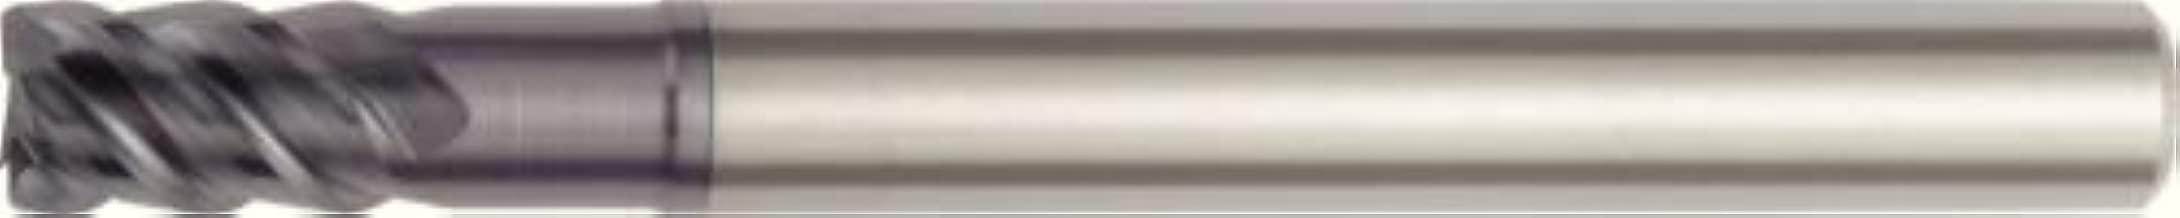 WIDIA Hanita 75N520047LT Vision Plus 75N5 HP Hard Material End Mill, 2 mm Rad, 20 mm Cutting Dia, Carbide, TiAlN, RH Cut, Straight Shank, 4-Flute